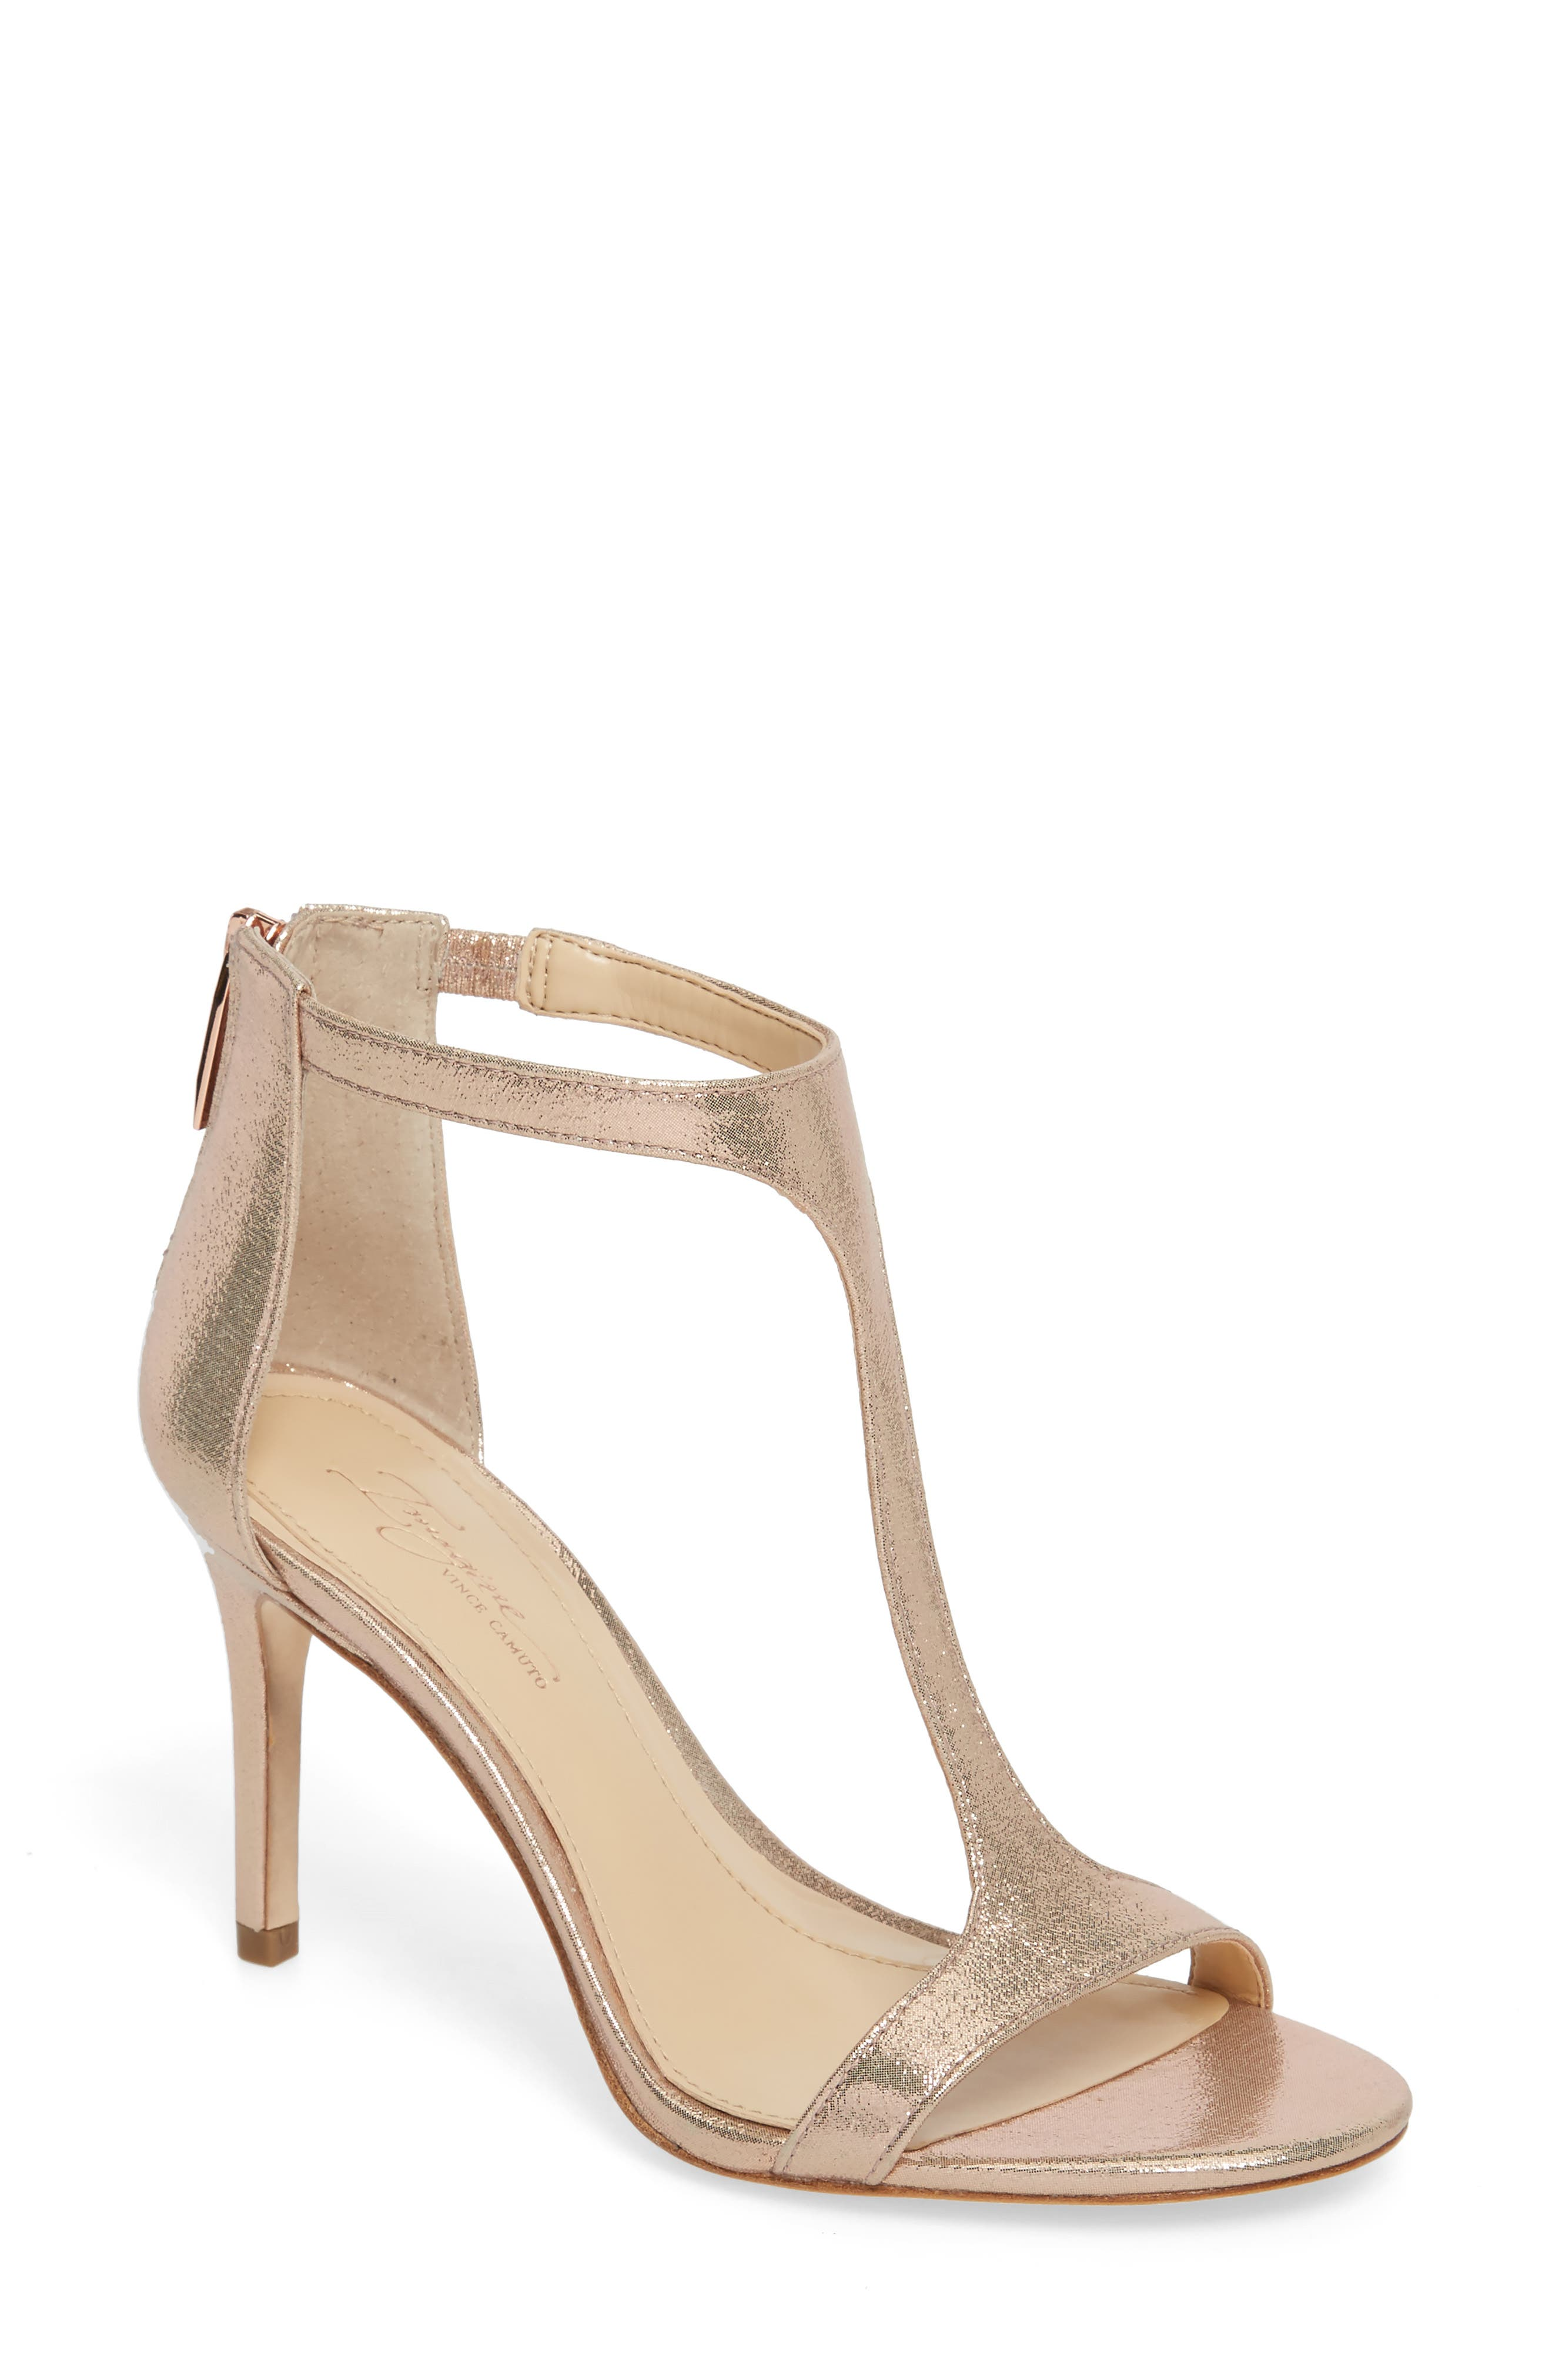 Alternate Image 1 Selected - Imagine by Vince Camuto 'Phoebe' Embellished T-Strap Sandal (Women)